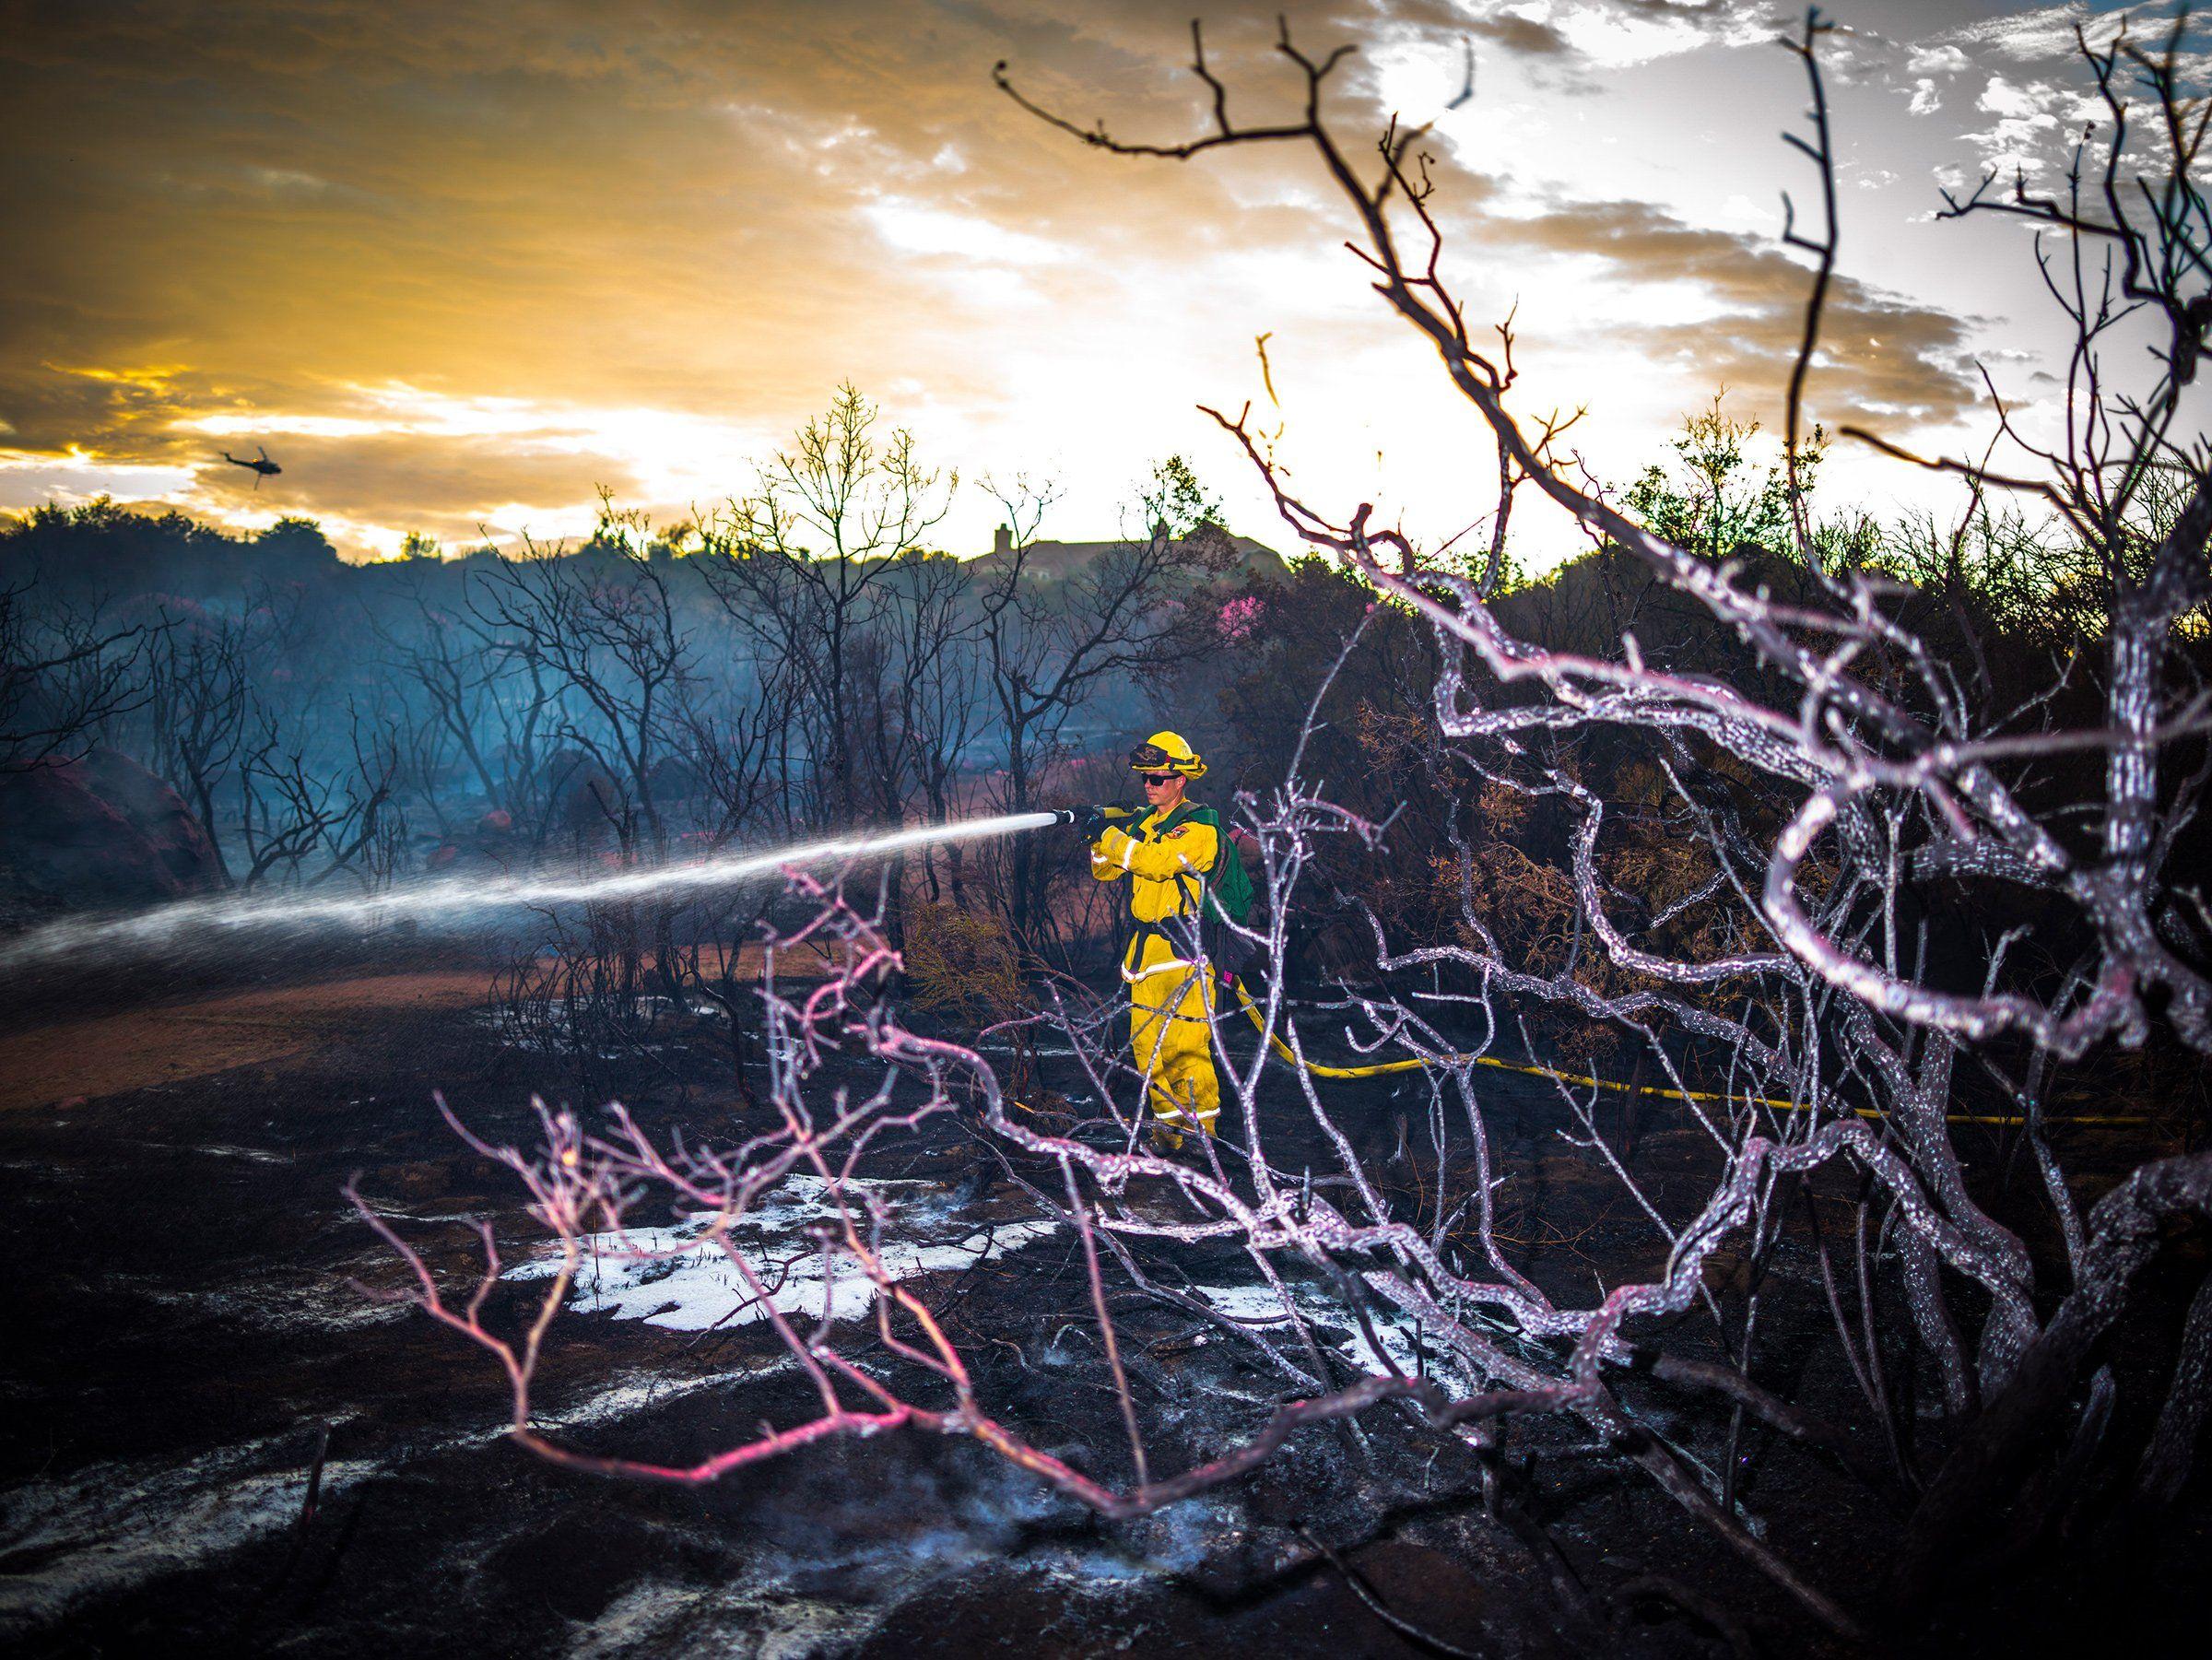 A firefighter extinguishes hotspots near the origin of the Tenaja Fire near Murrieta, Calif., on Sept. 5.